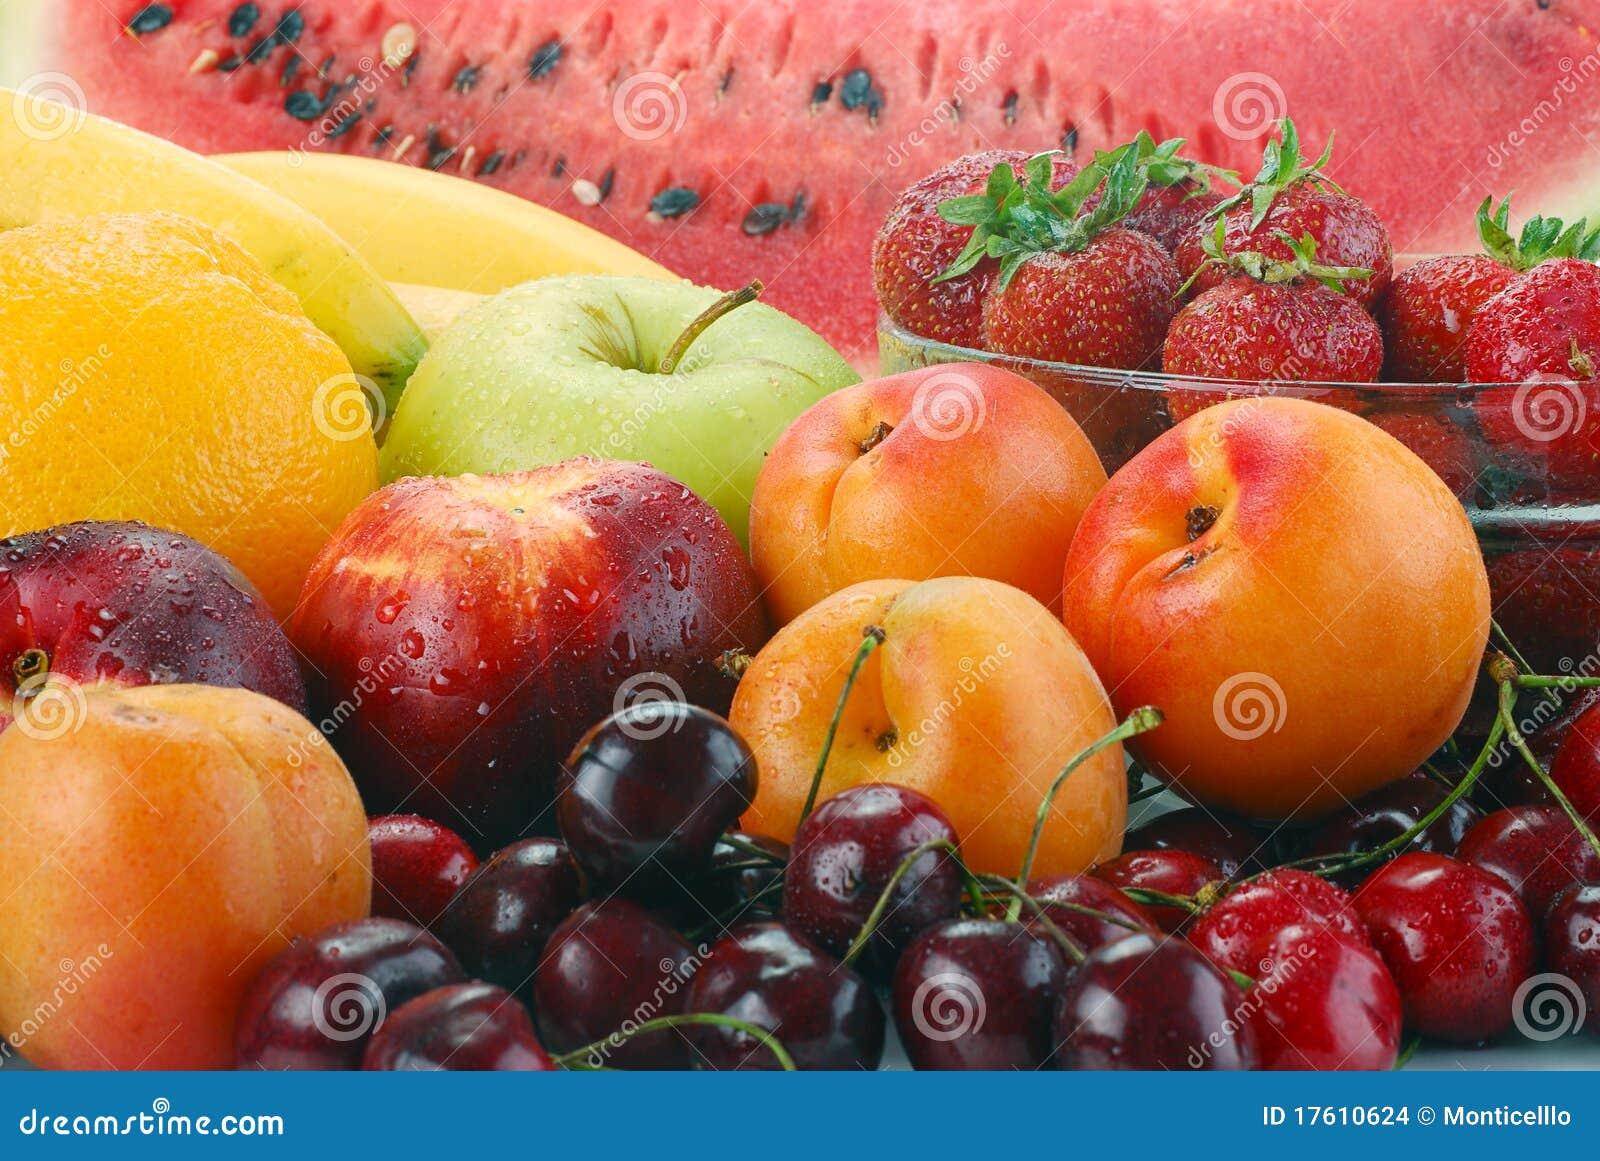 плодоовощи состава